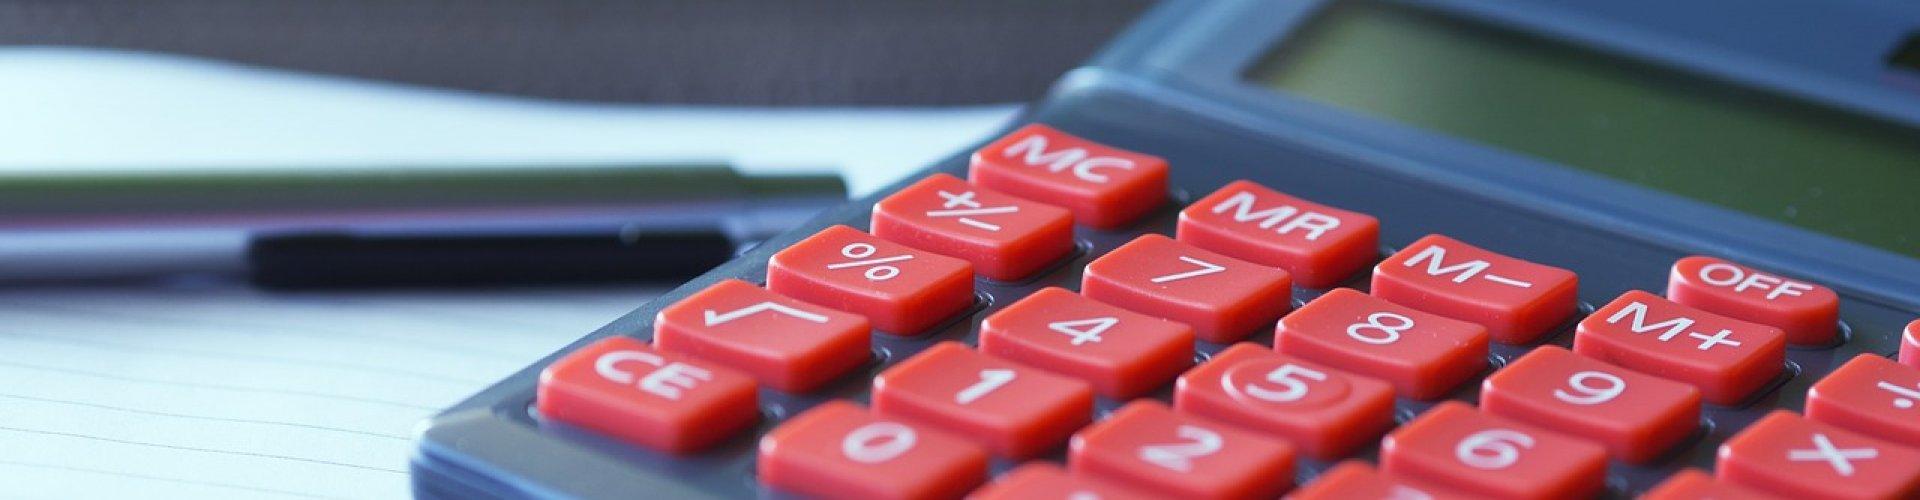 Uitleg relatie basissalaris | Interne tarief | Verkooptarief | Bonus